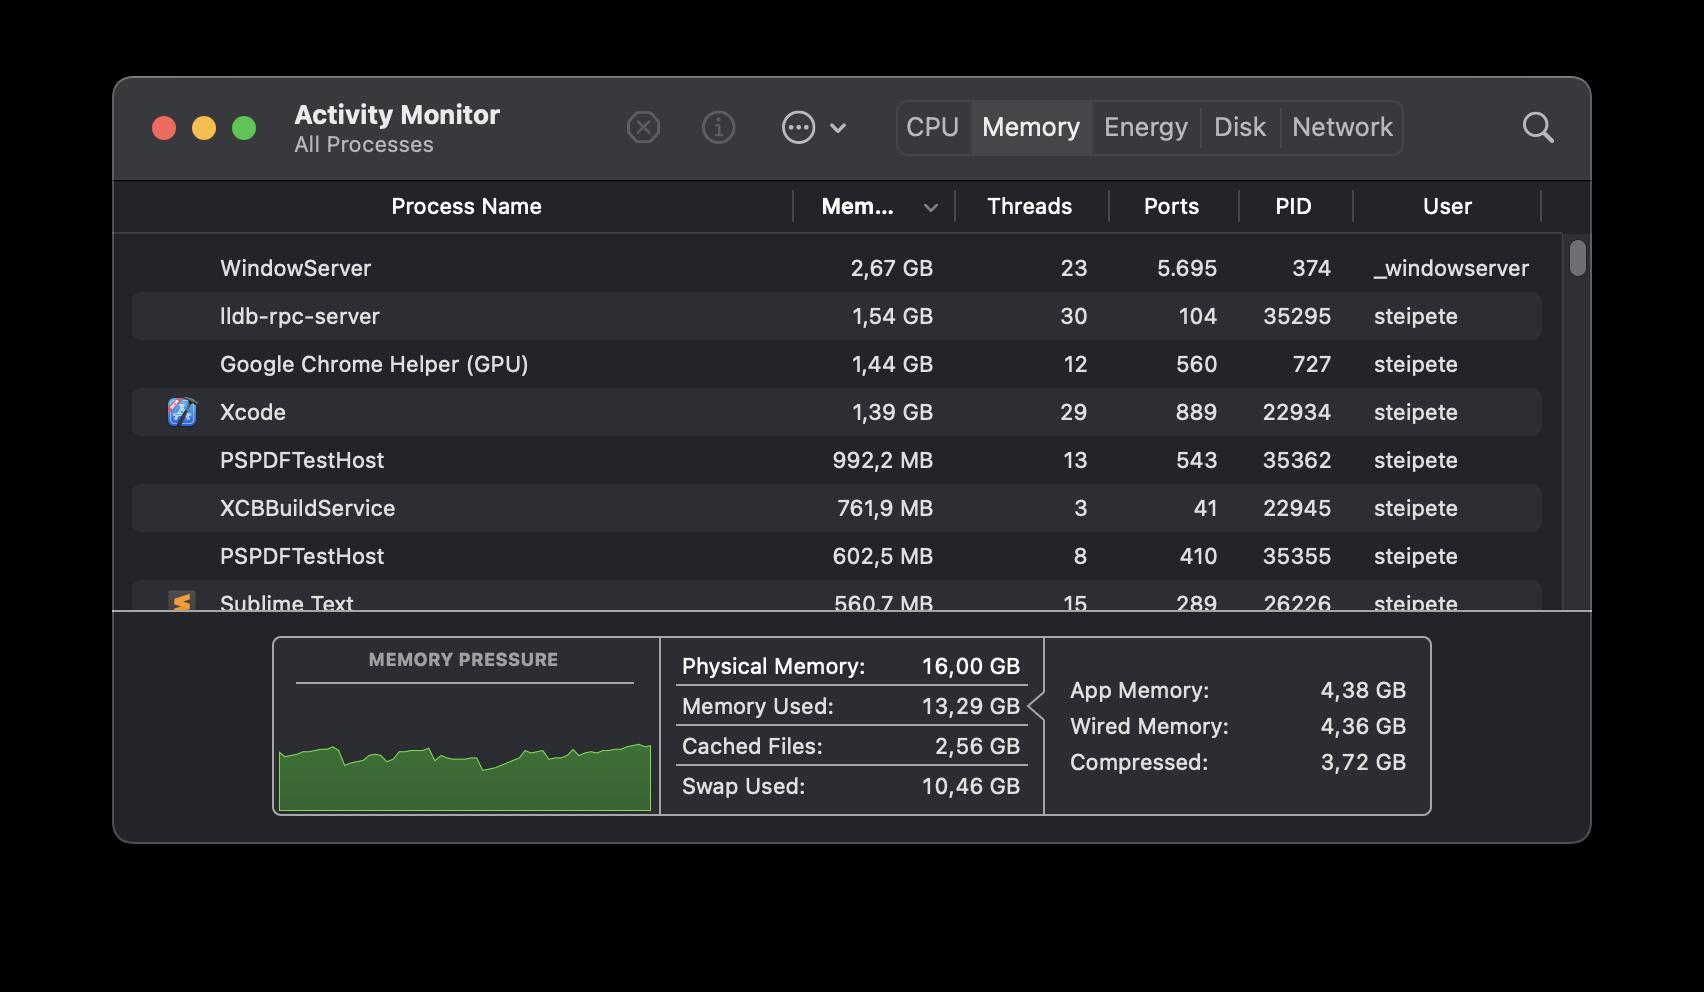 umair-akbar-memory - Apple Silicon M1: A Developer's Perspective